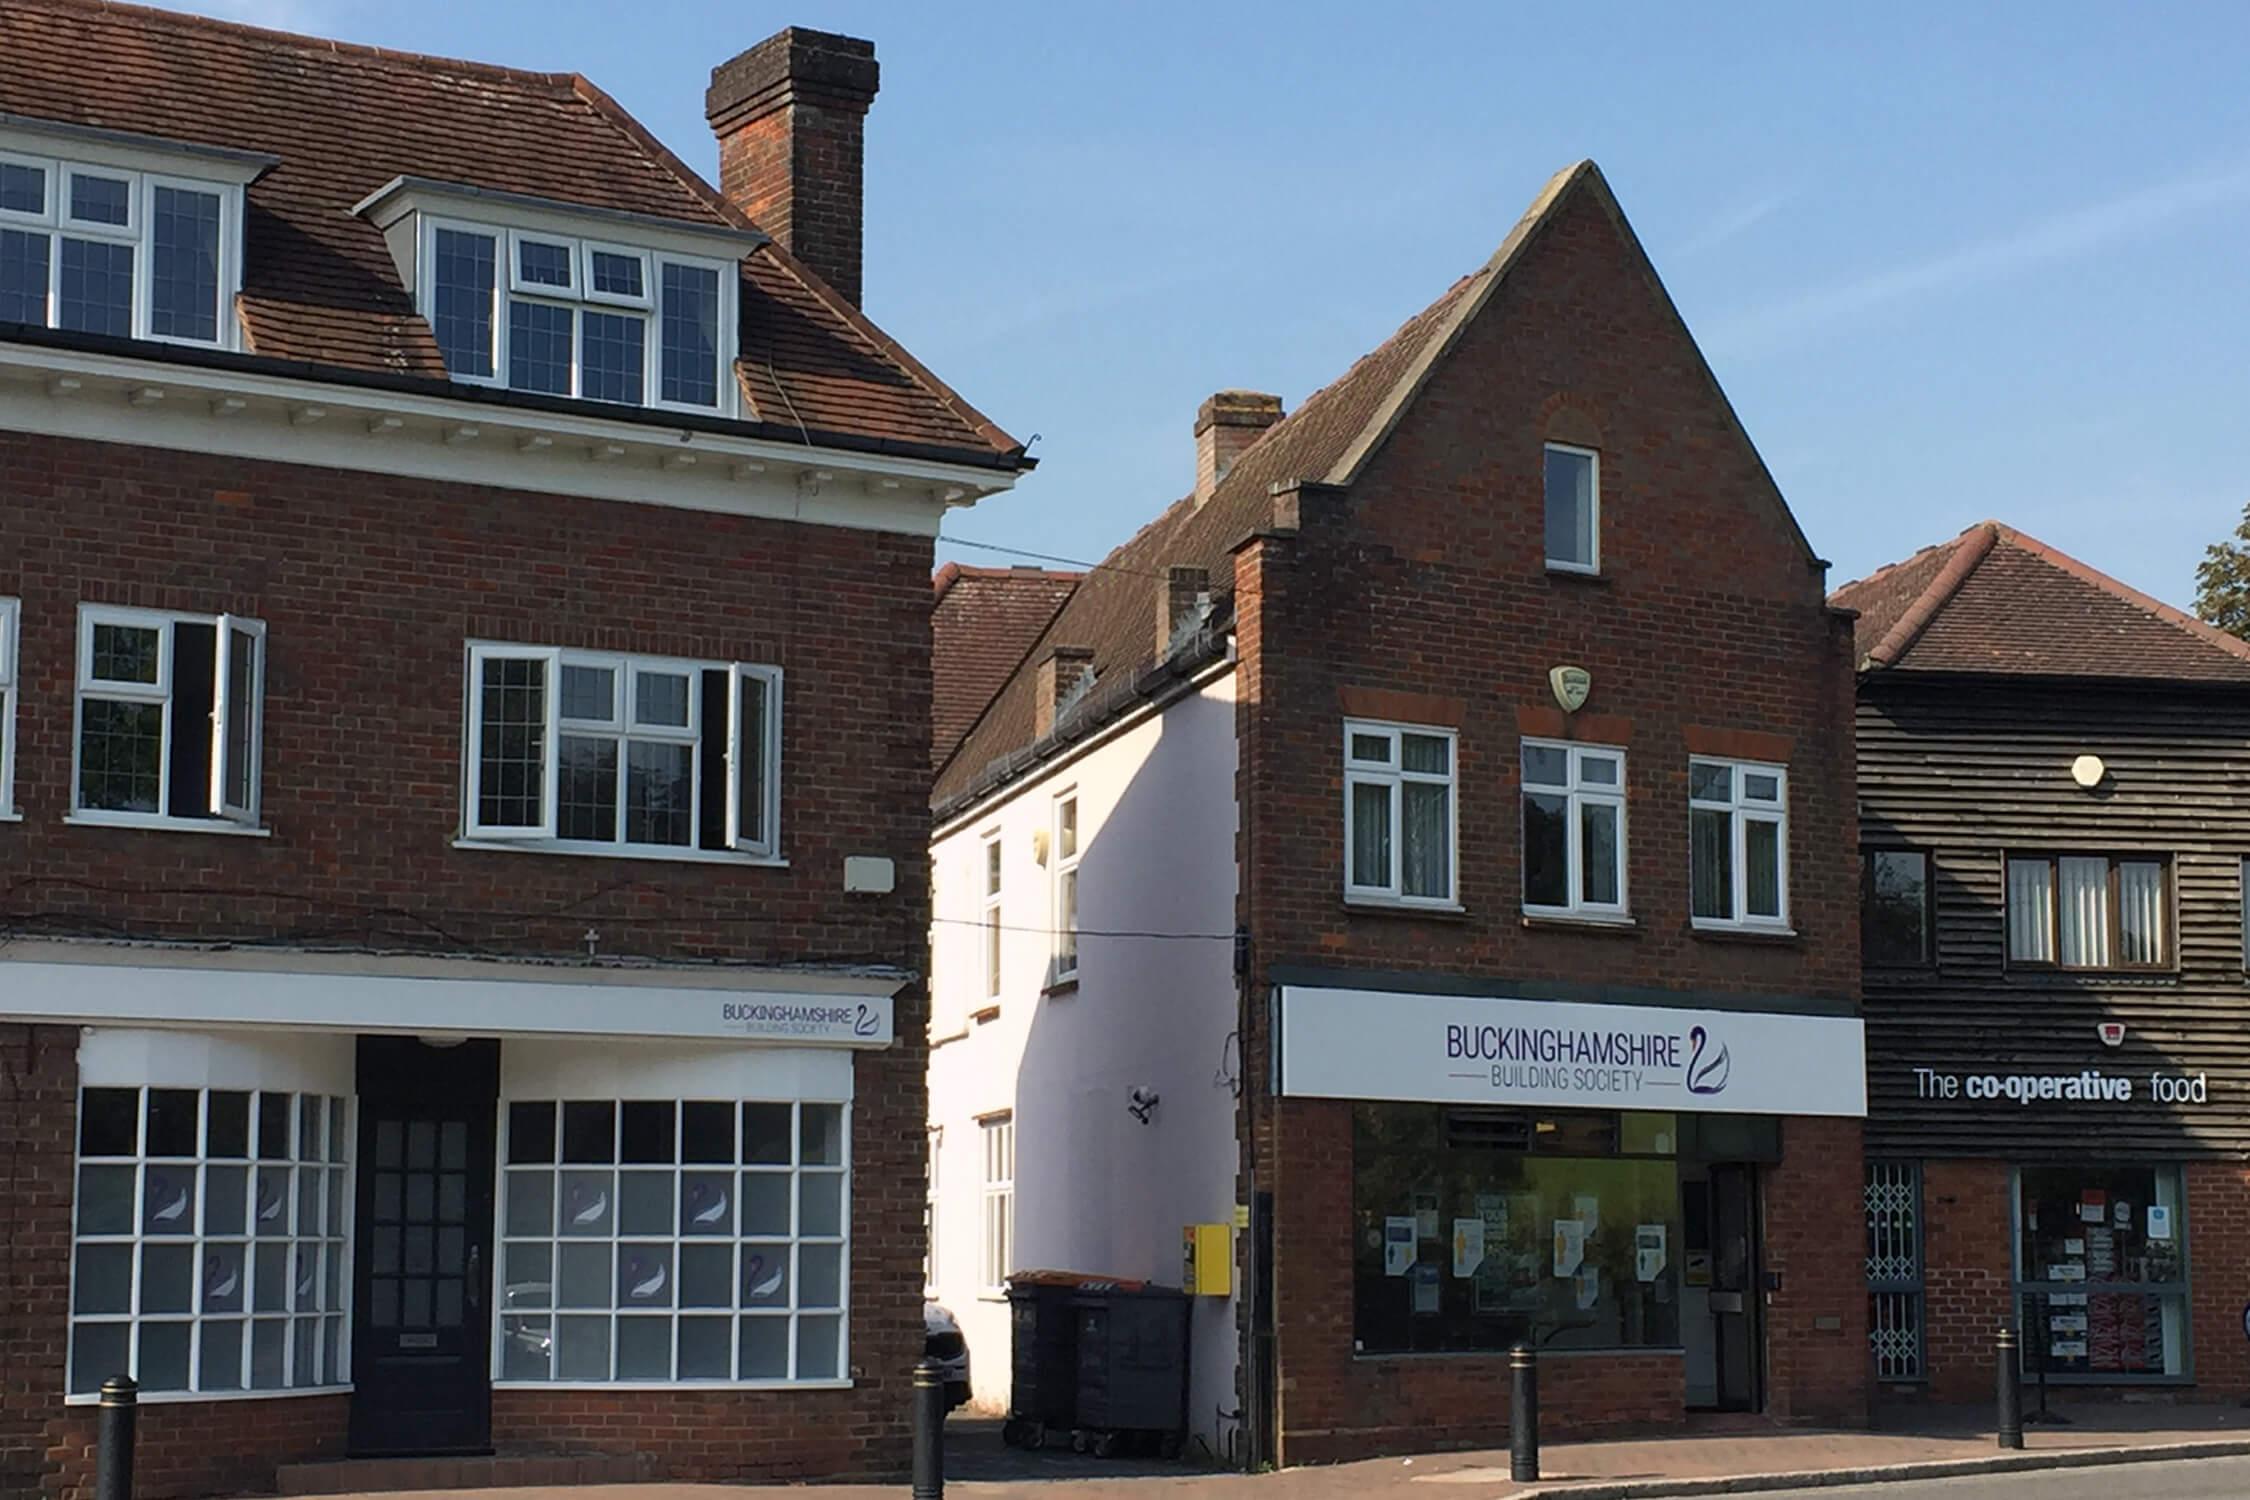 Buckinghamshire Building Society head office